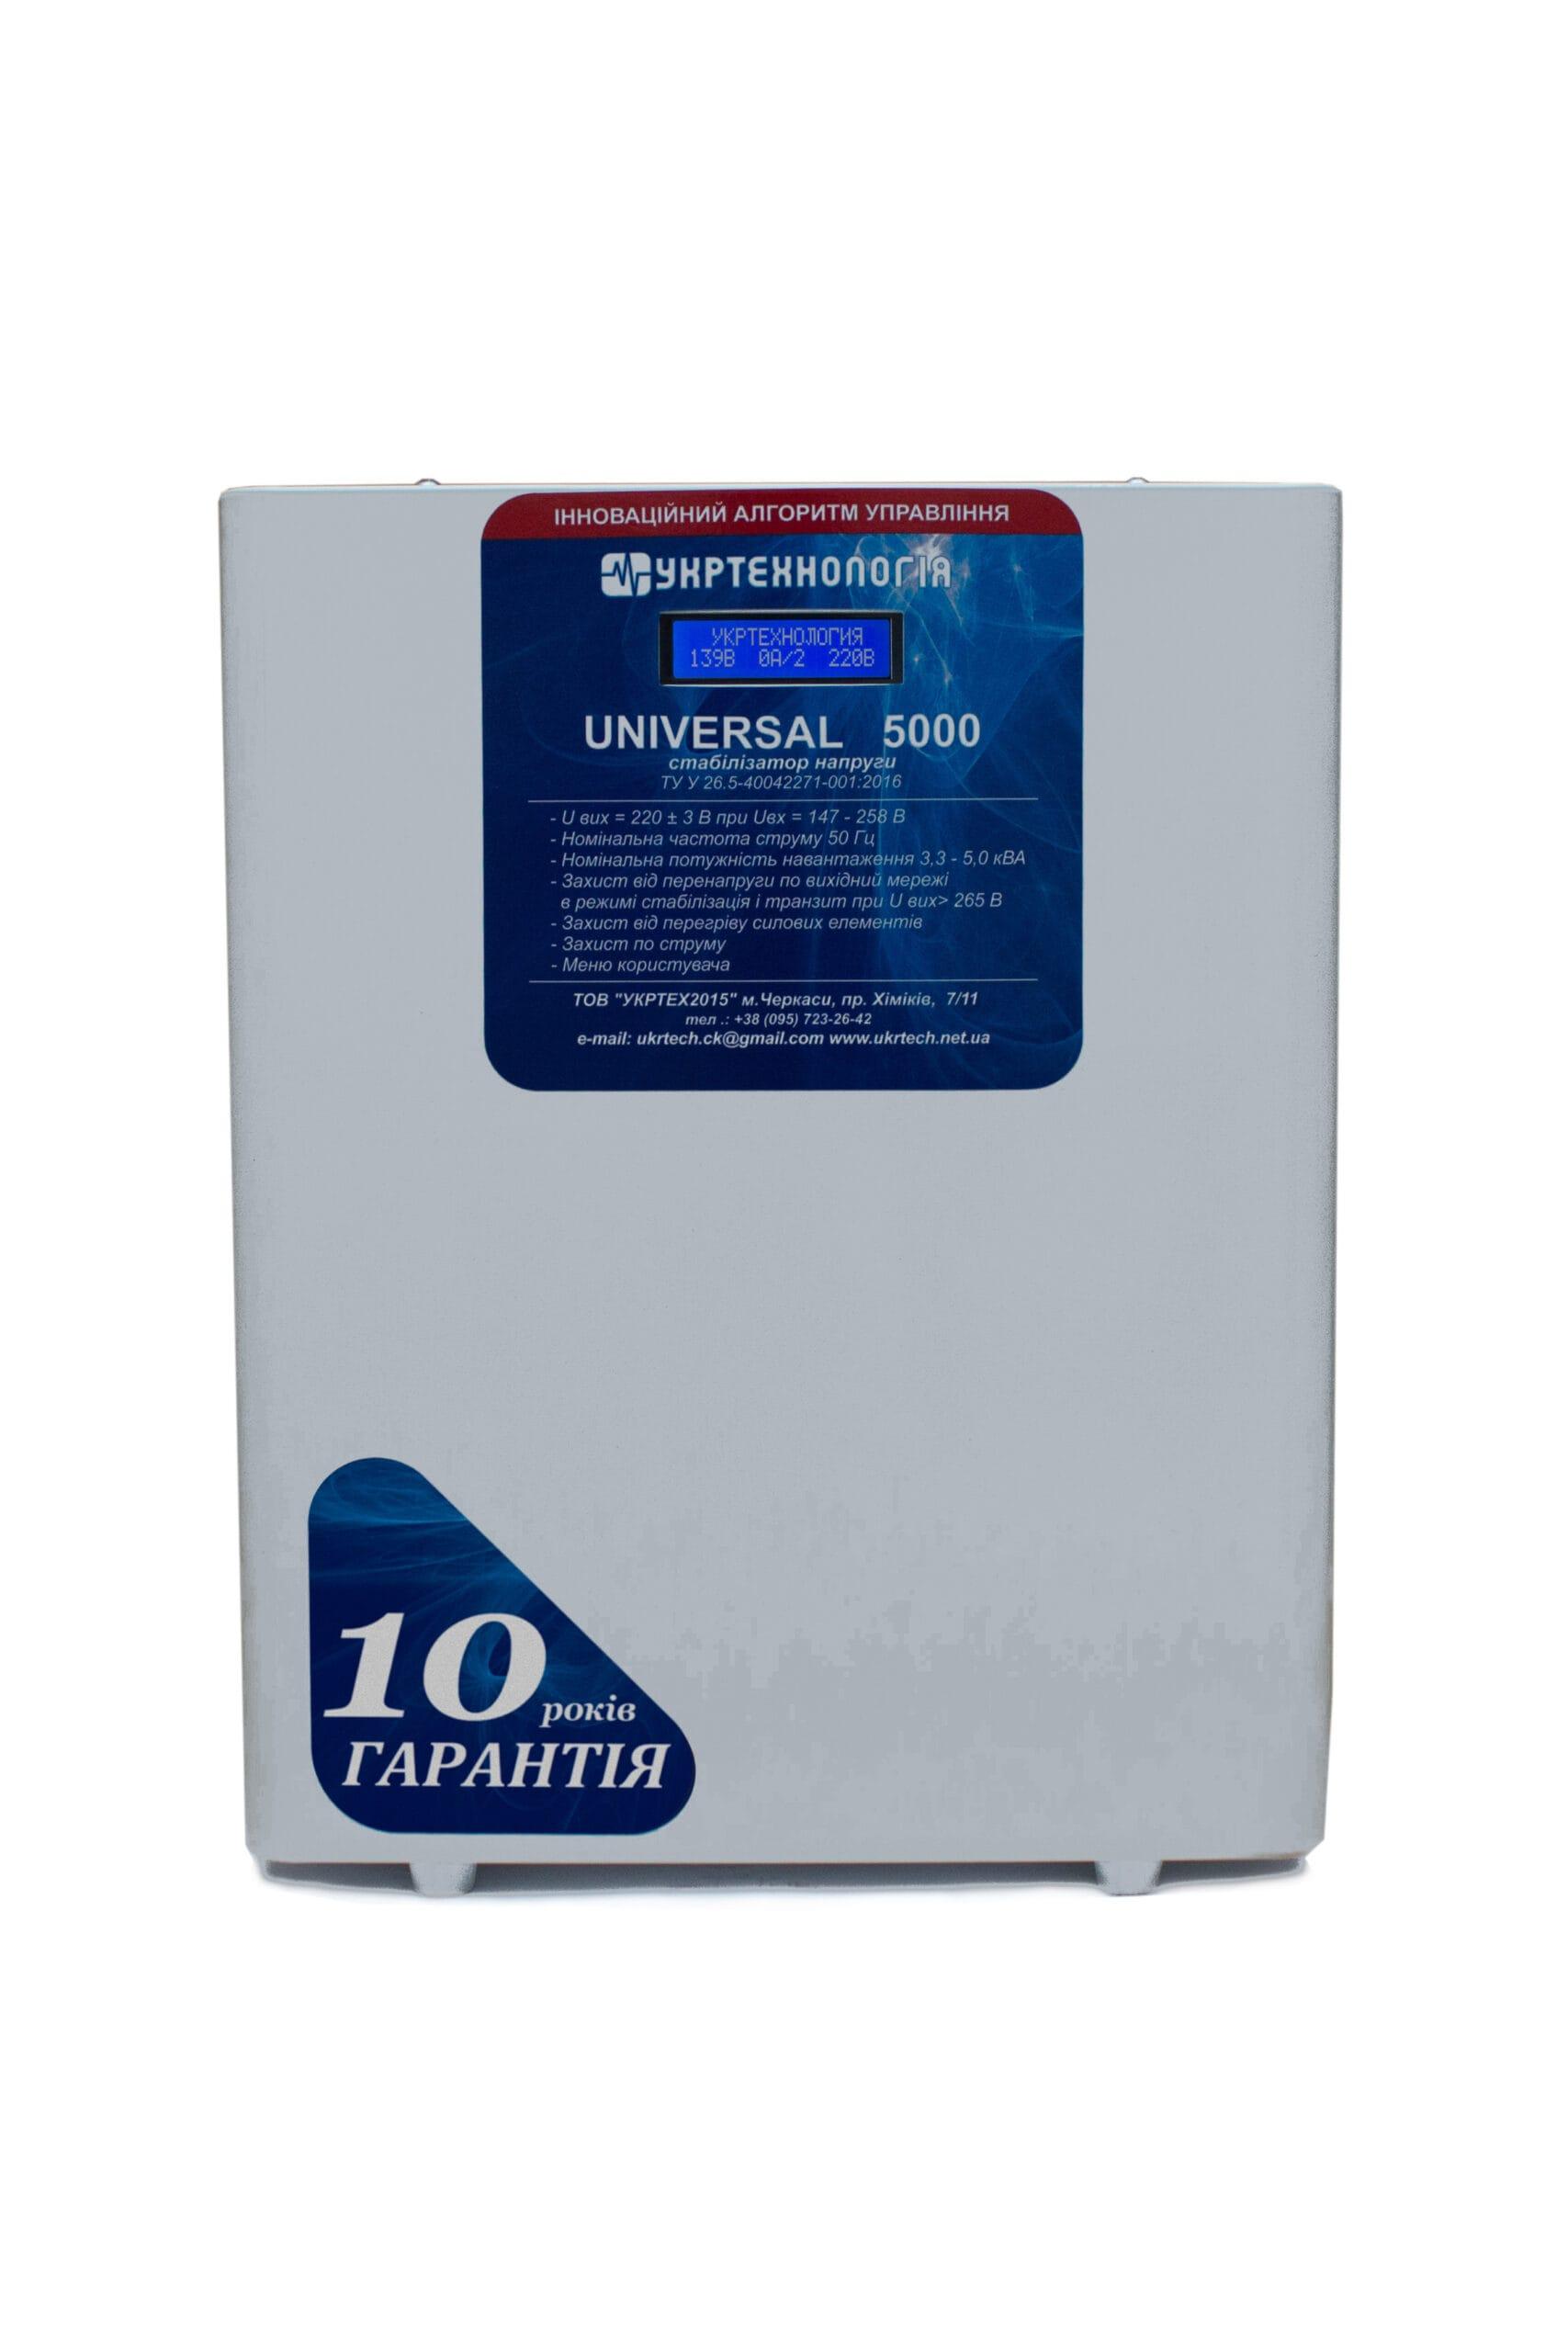 Стабилизаторы напряжения - Стабилизатор напряжения 5 кВт UNIVERSAL 000001417 - Фото 3